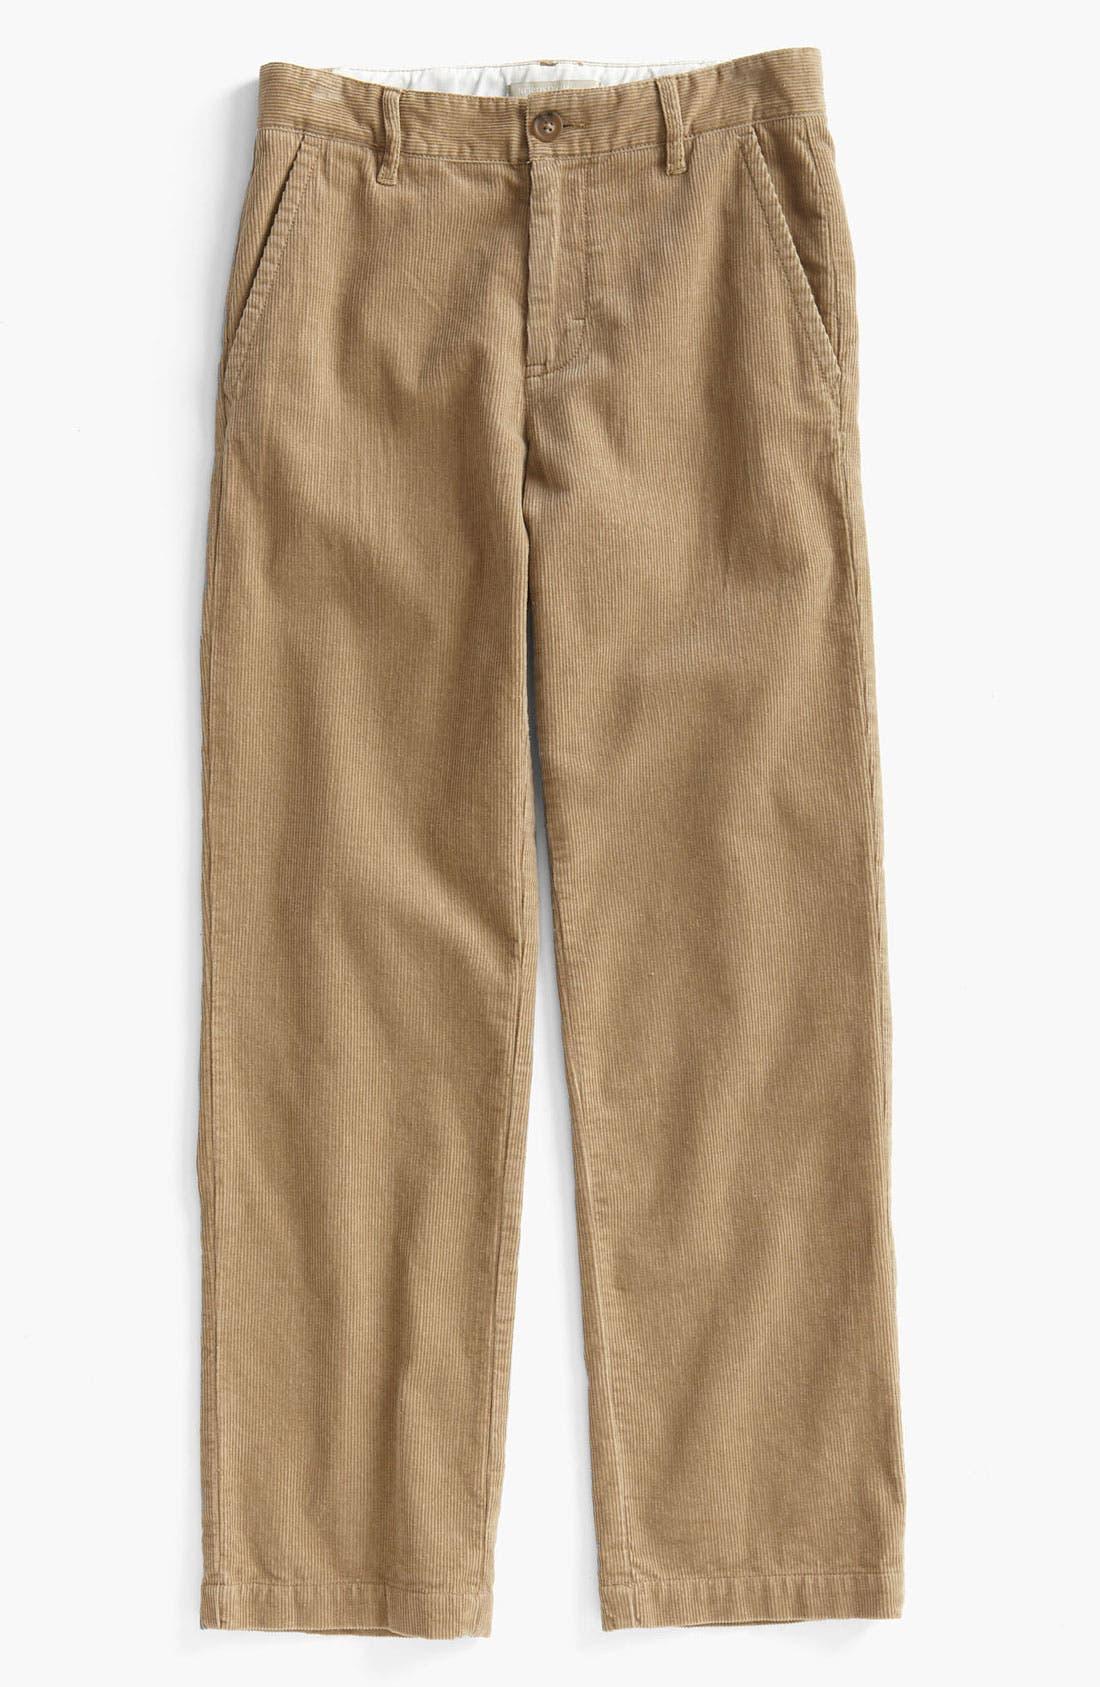 Main Image - Nordstrom 'Edward' Corduroy Trousers (Big Boys)